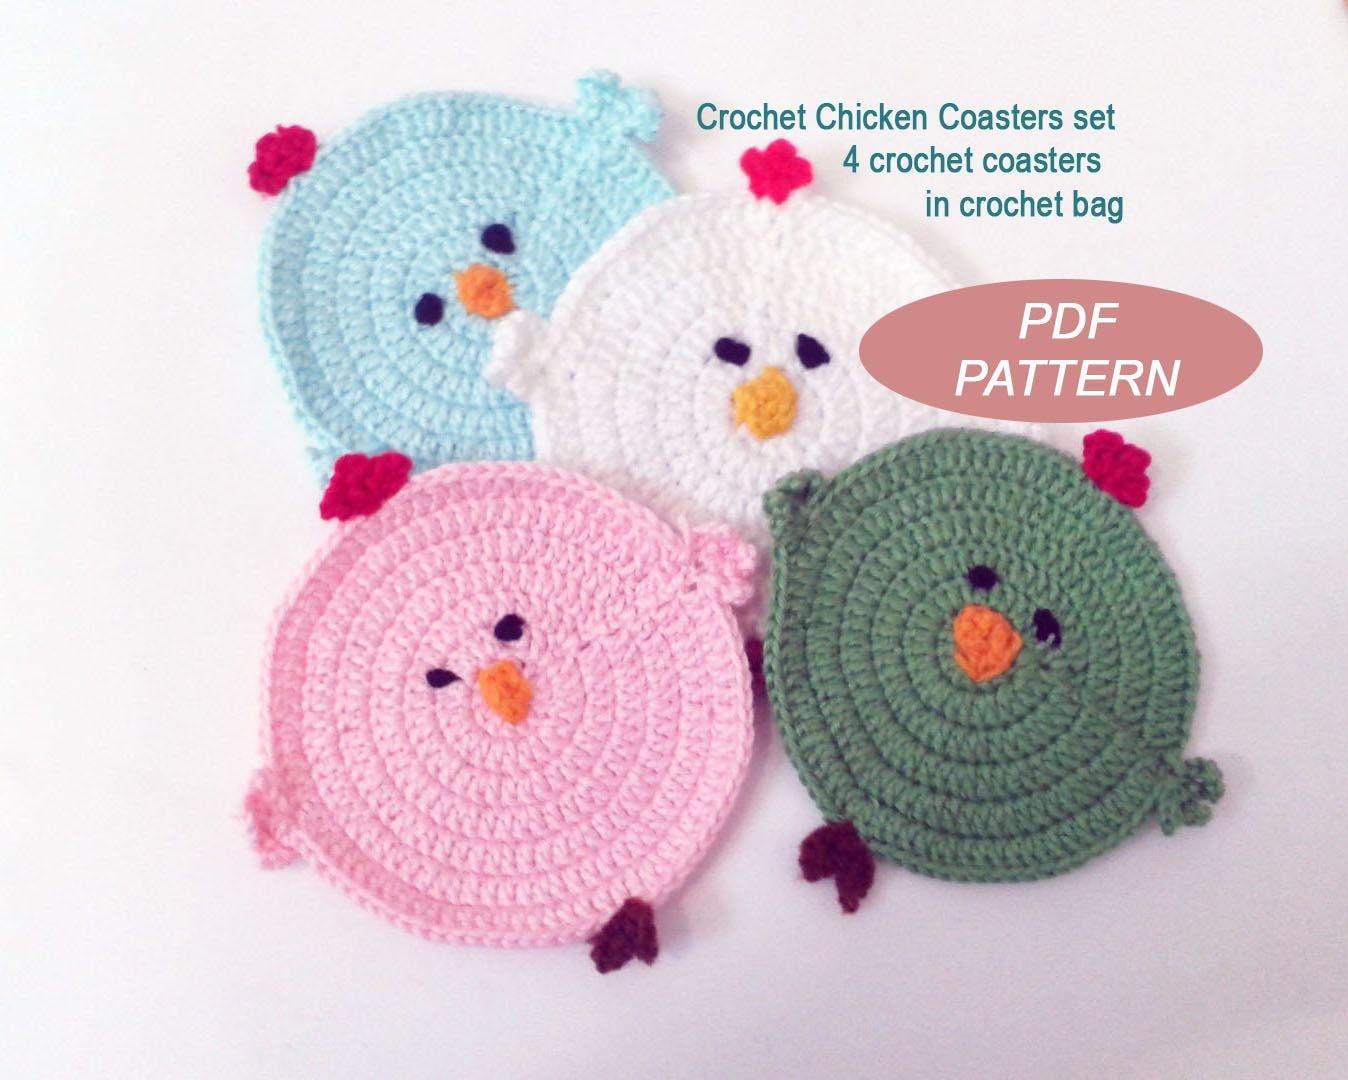 Crochet Chicken Coasters Pdf Pattern Diy Crochet Coaster Etsy